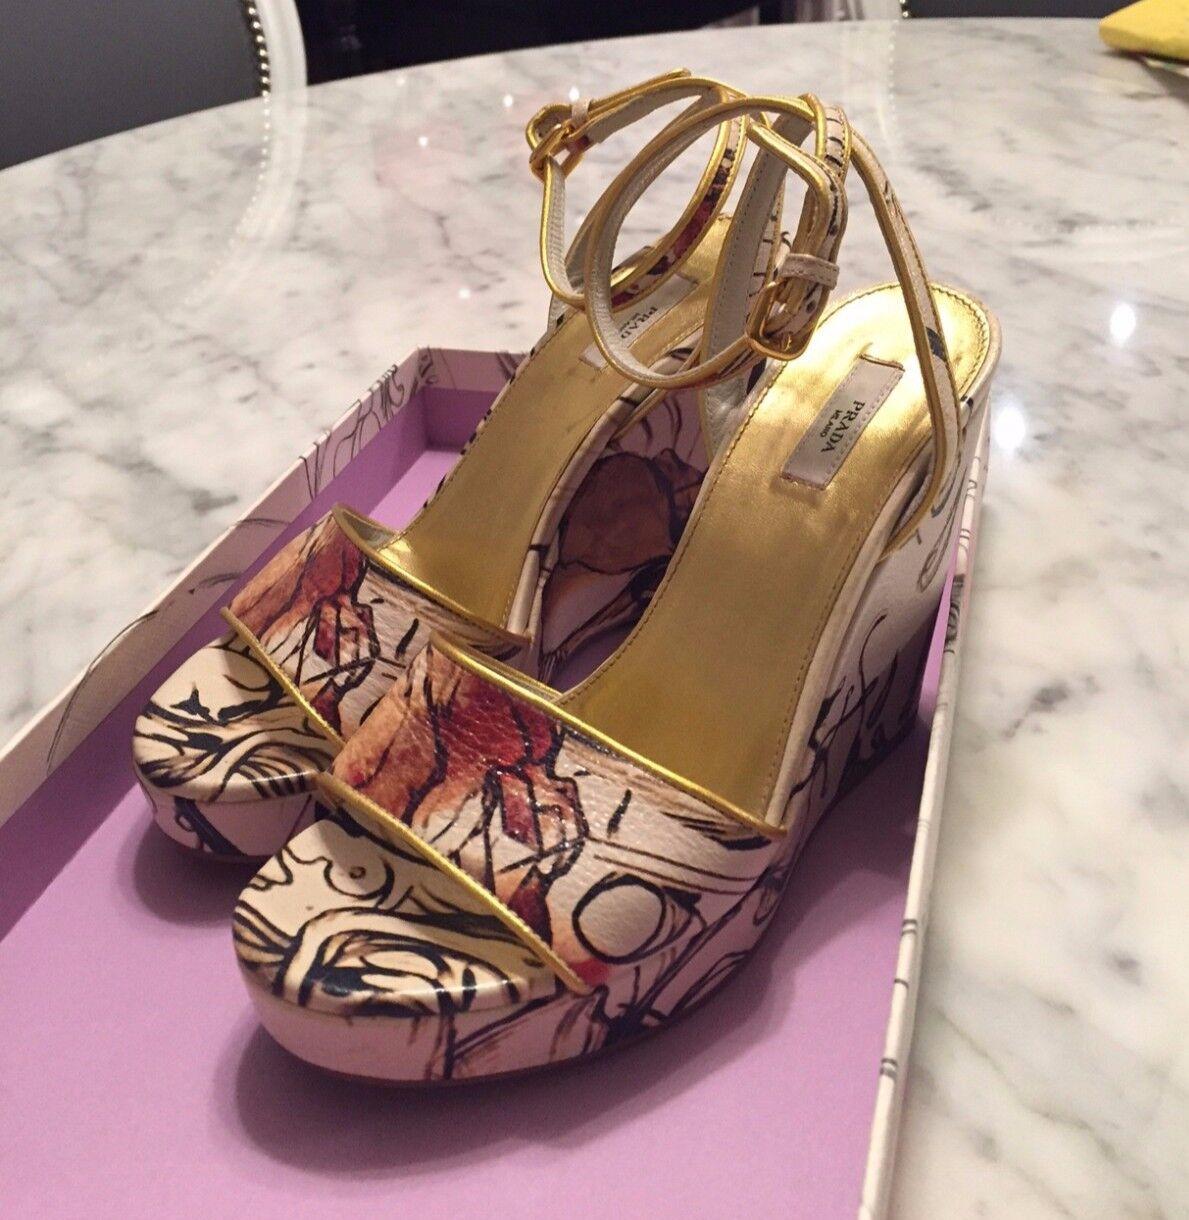 Prada Cervo Lux Print Wedge Sandals - Fairy Runway Collection